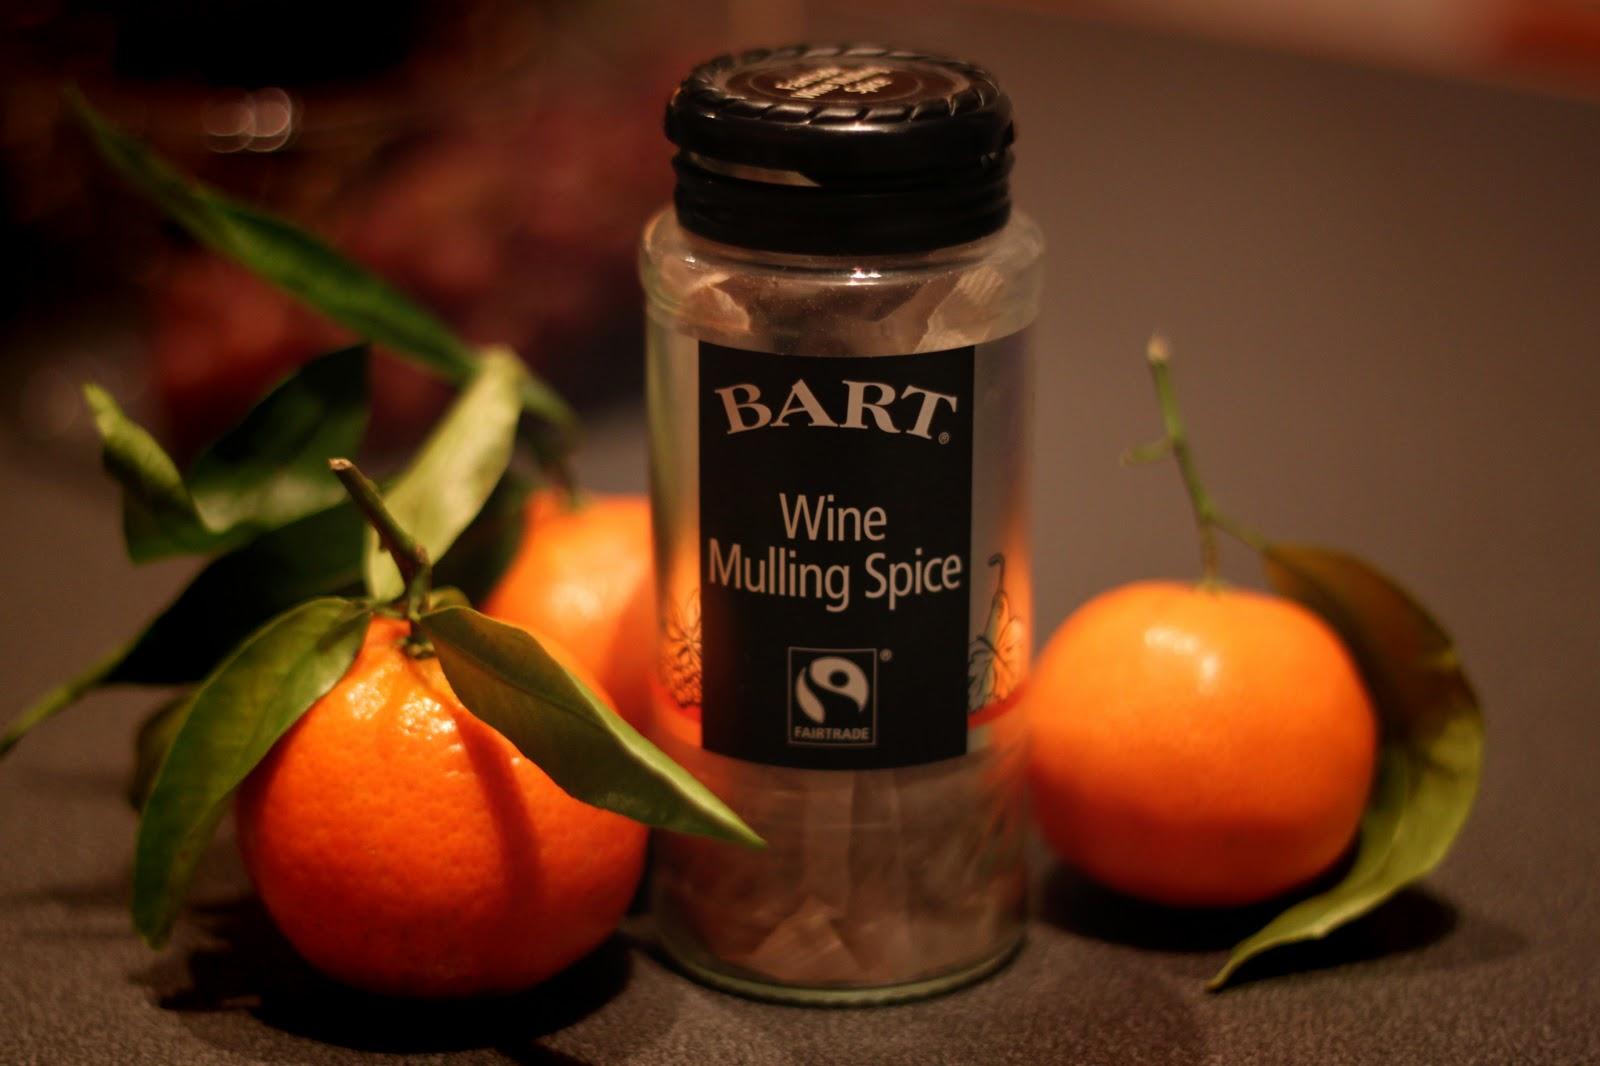 Wine mulling spice